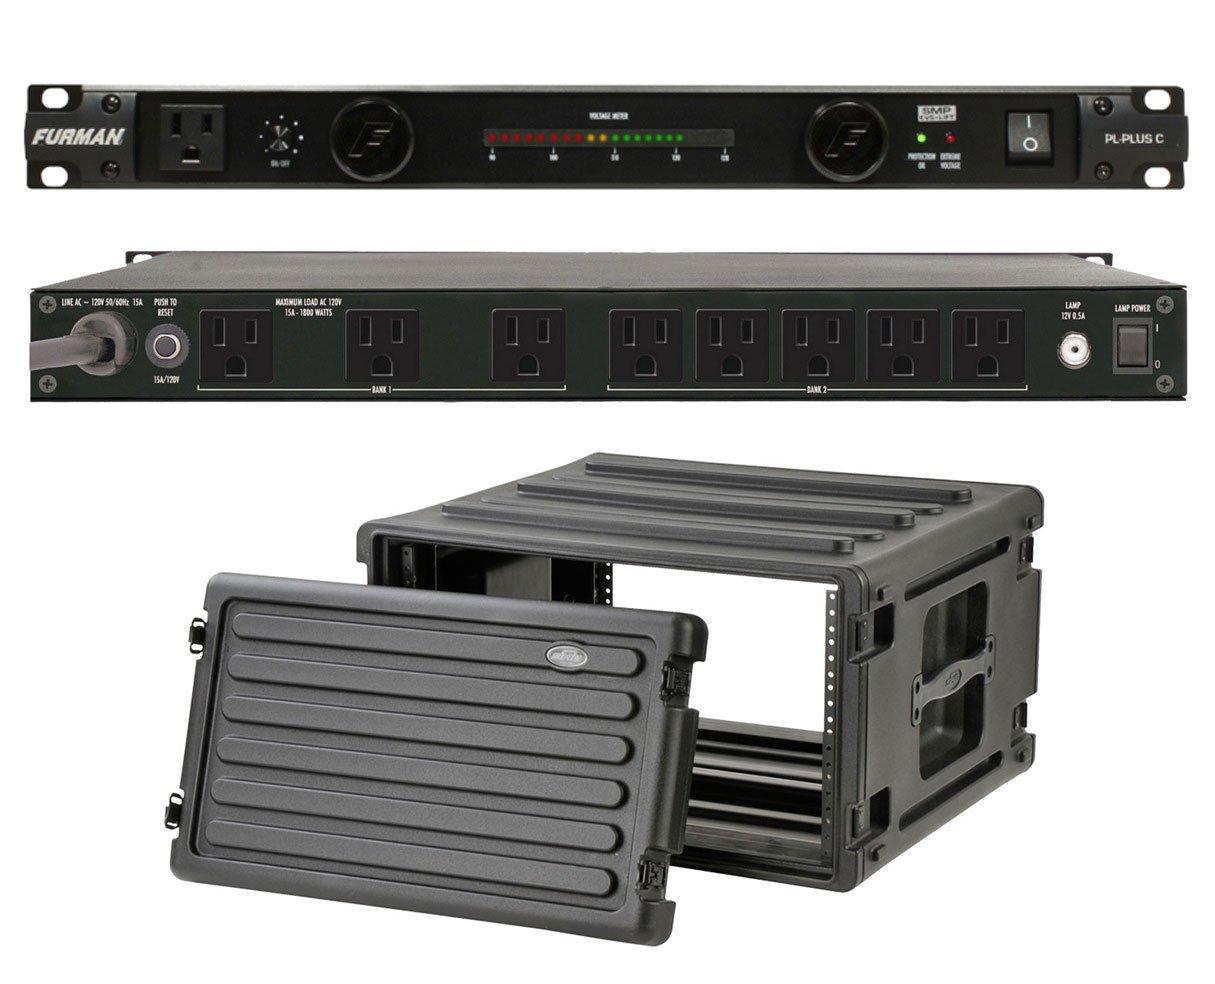 Furman PL-Plus C 15 Amp Power Conditioner + SKB 1SKB-R6U Roto Molded 6U Rack